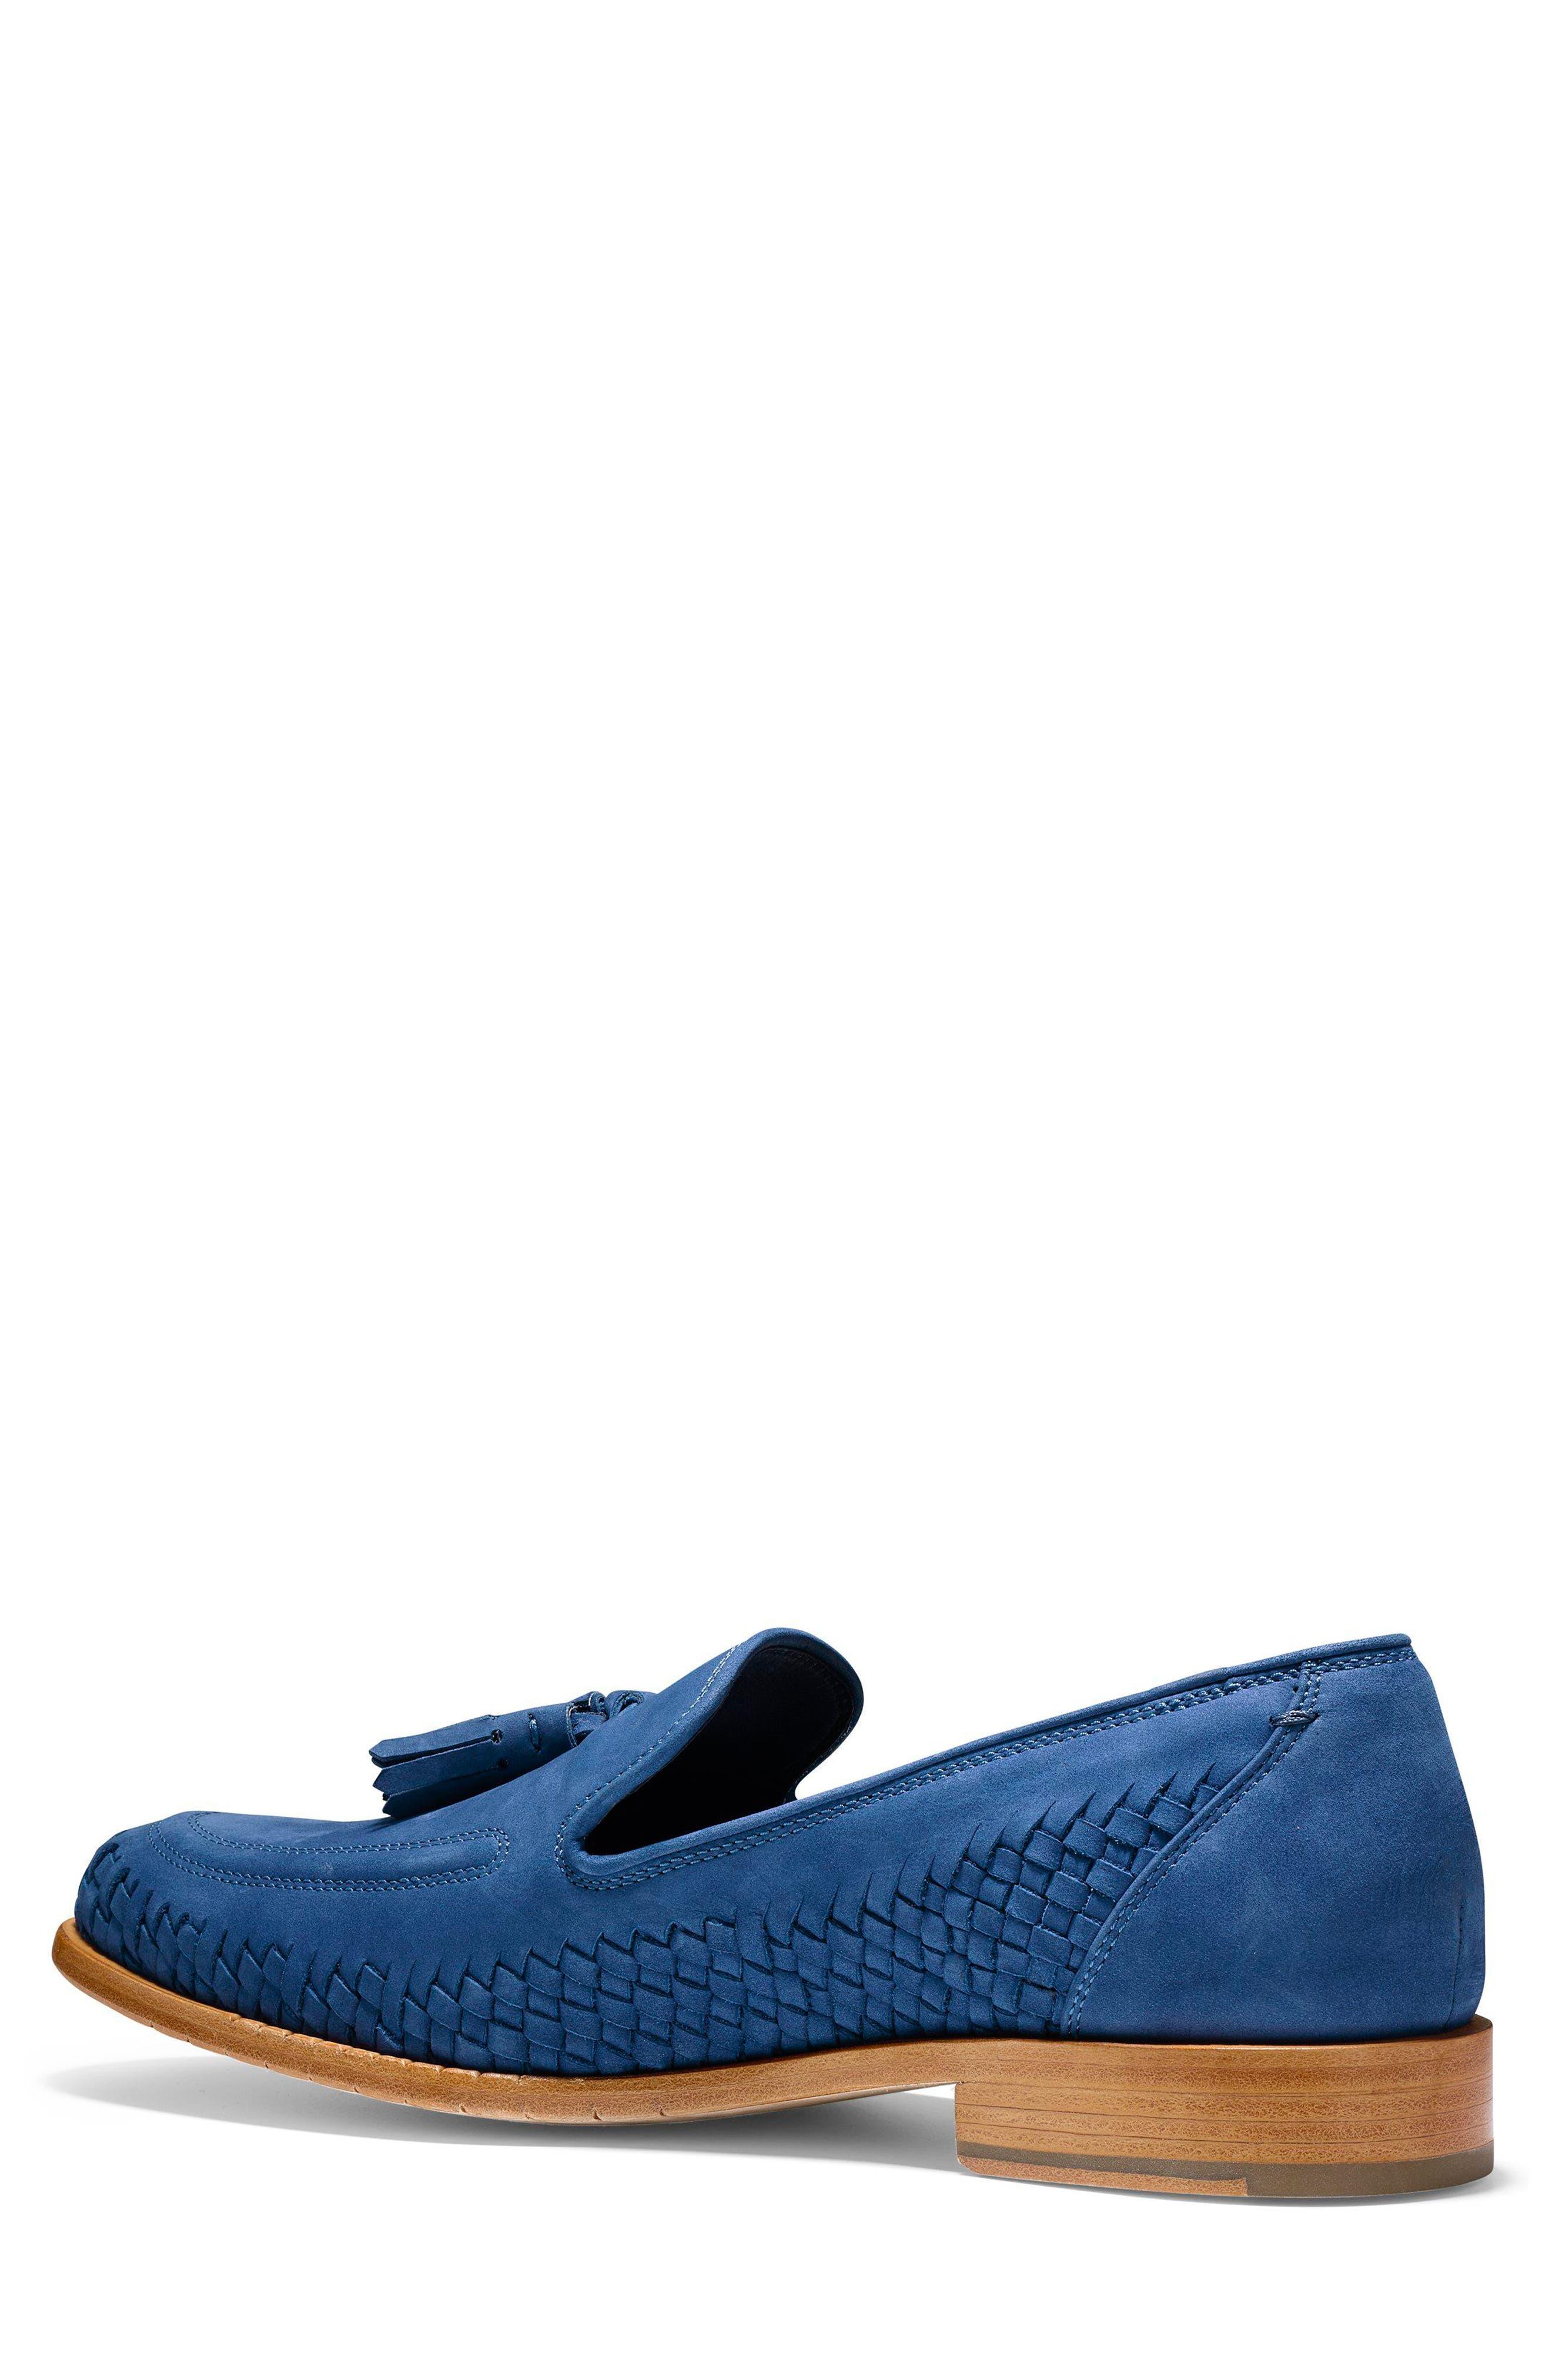 Washington Grand Tassel Loafer,                             Alternate thumbnail 8, color,